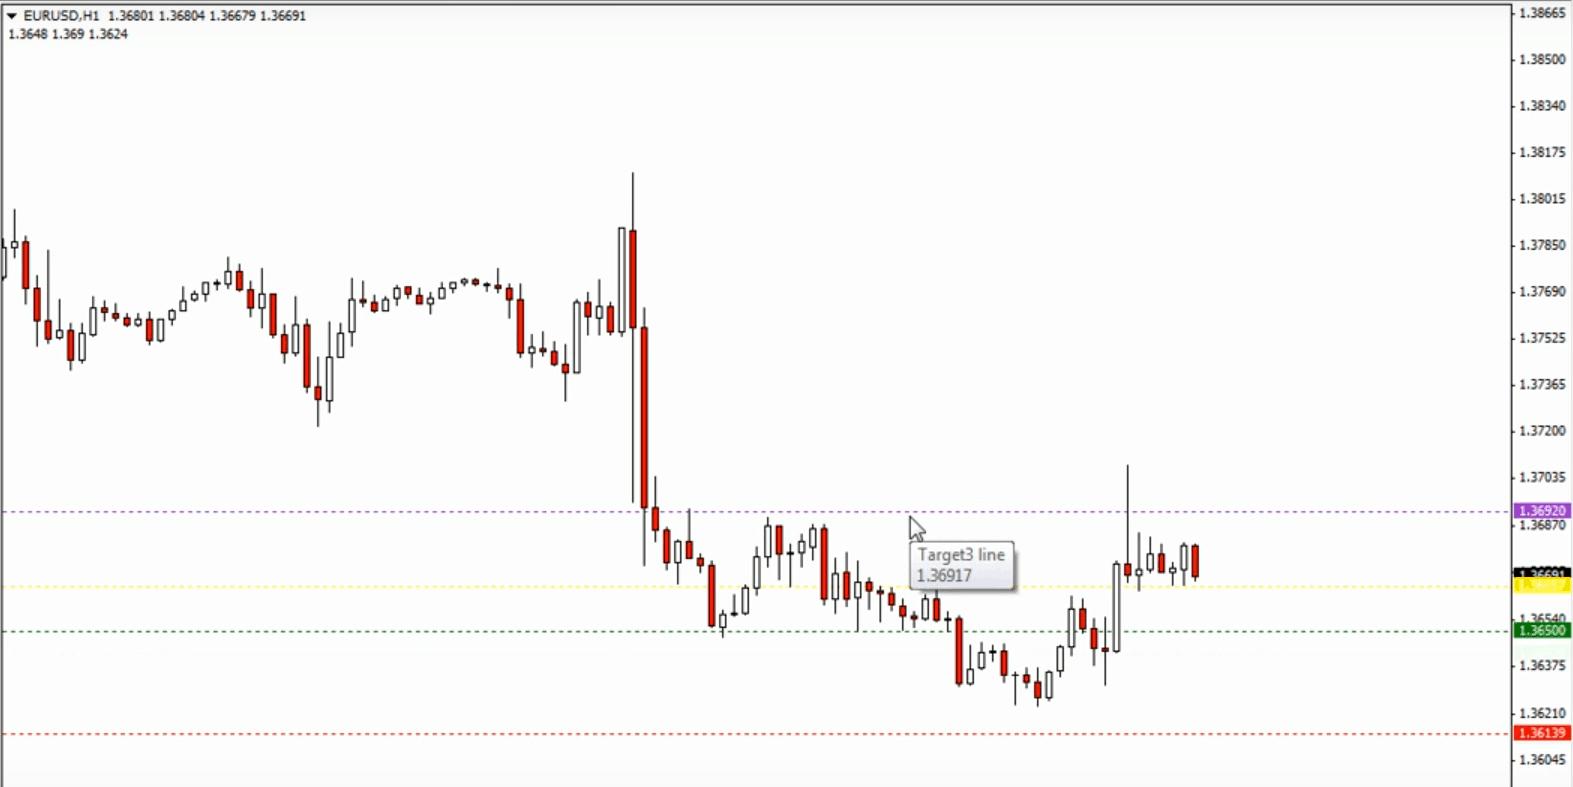 dinapoli indicator target line